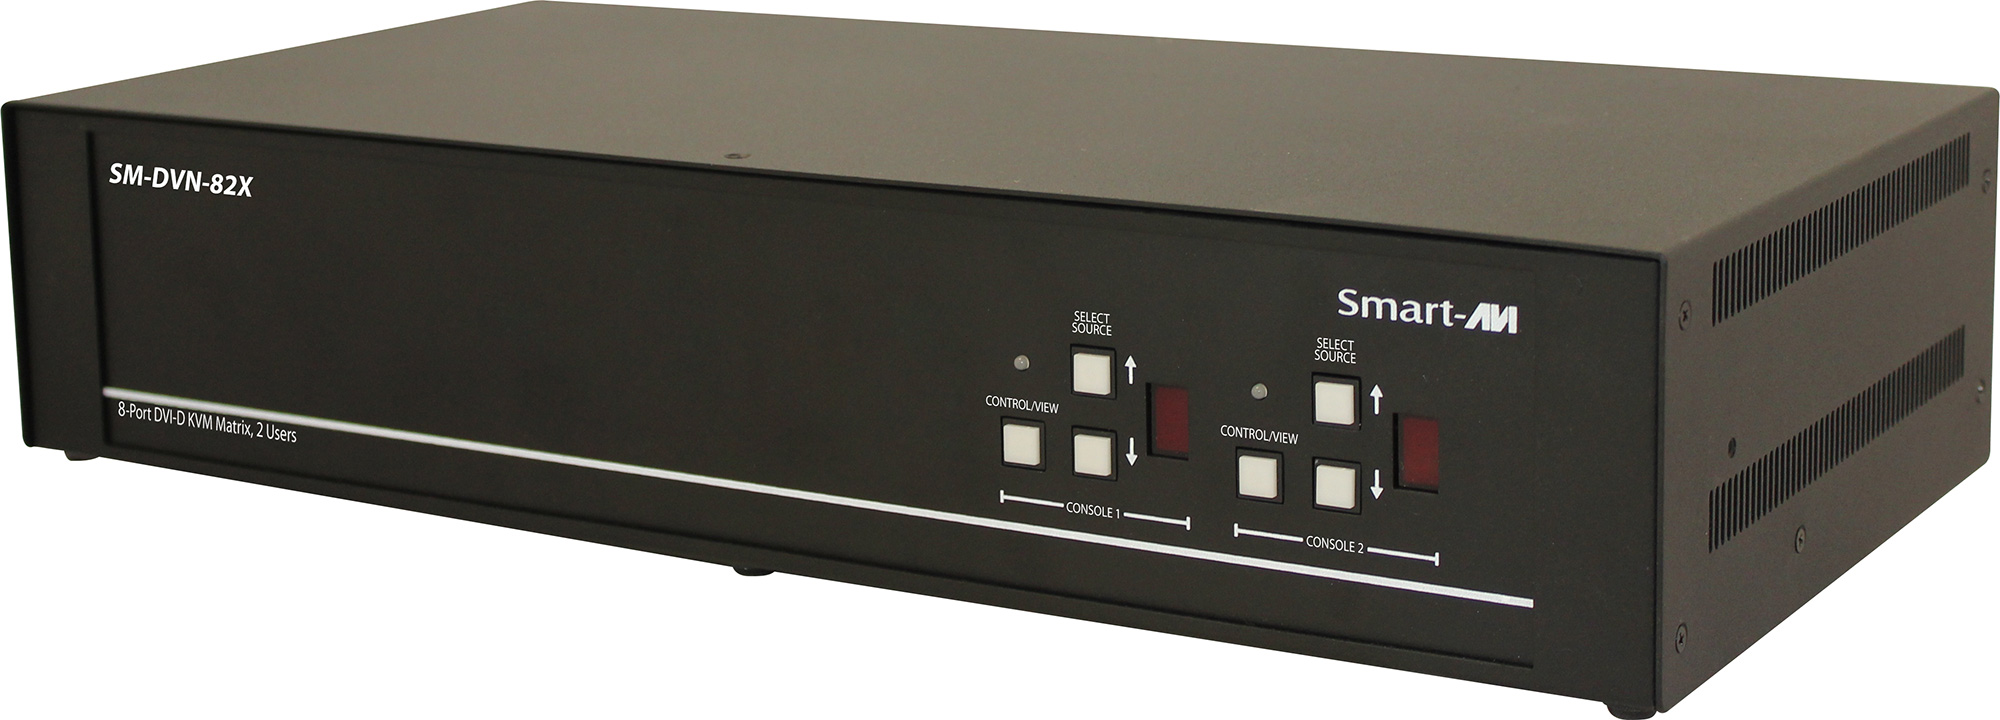 Smart AVI SM-DVN-82X DVI-D Matrix KVM Switch with Audio and USB 2.0 Support (2 Users) - 8 Port SAVI-SM-DVN-82X